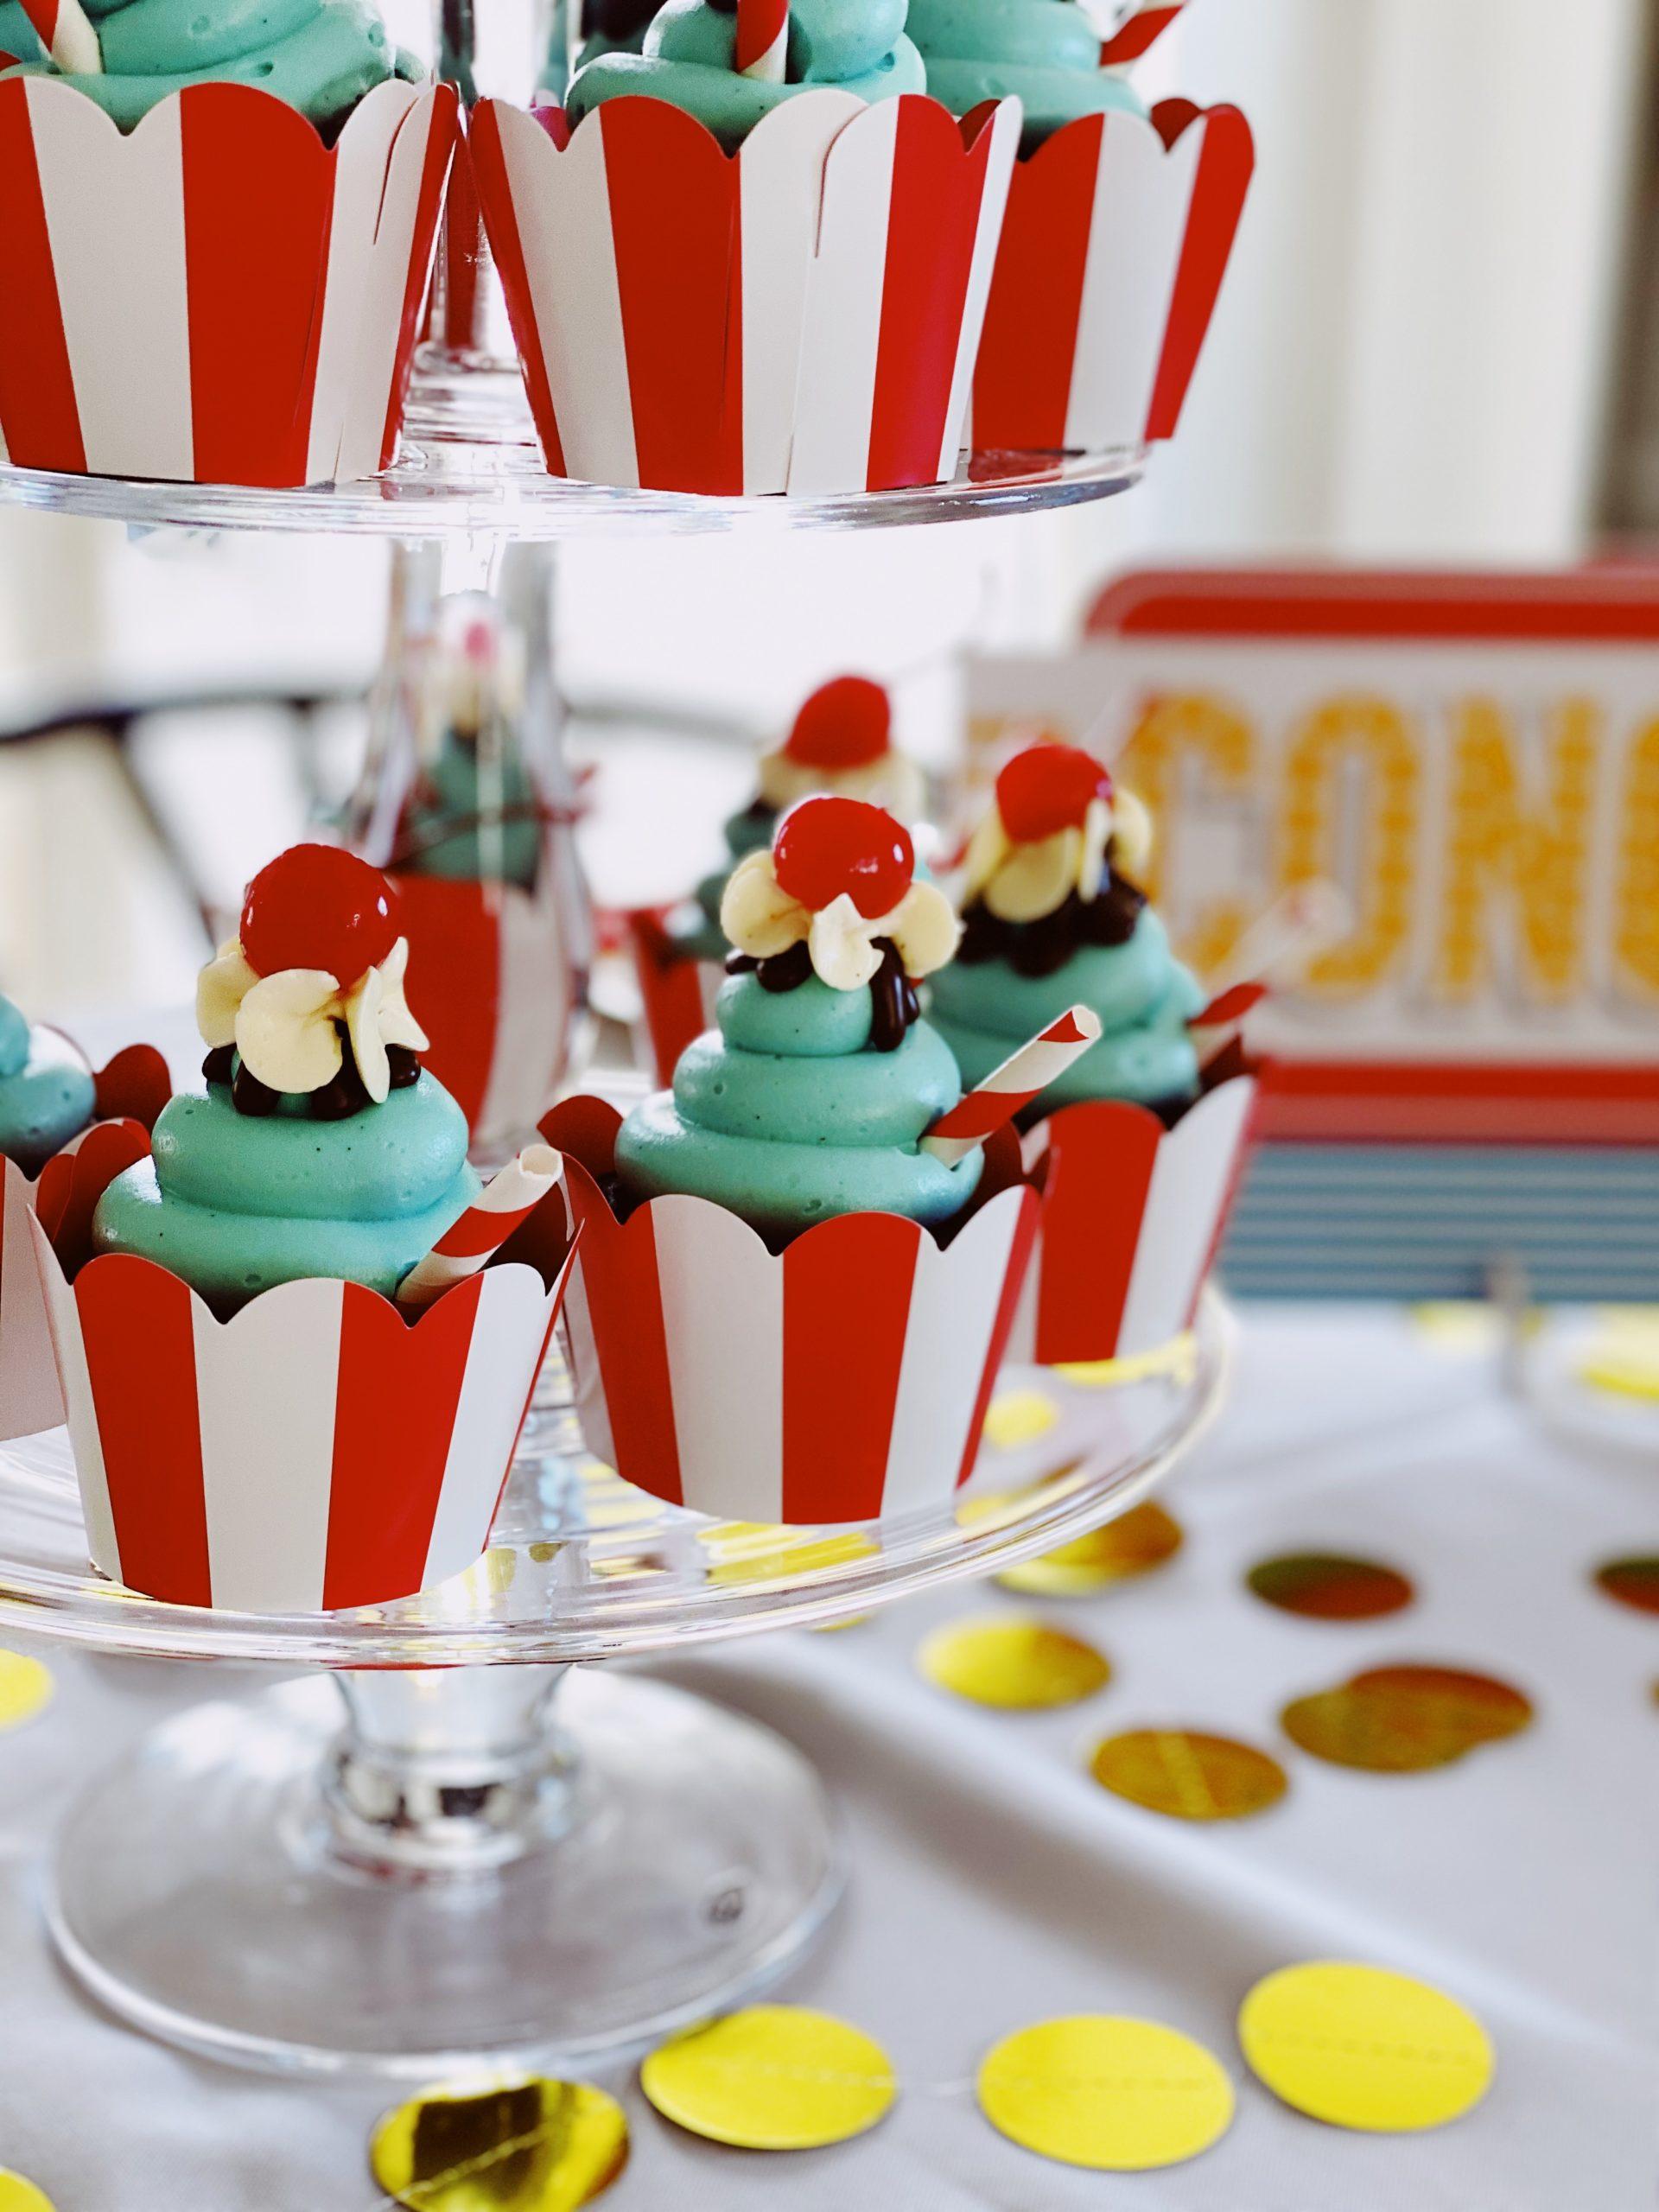 50s theme cupcakes